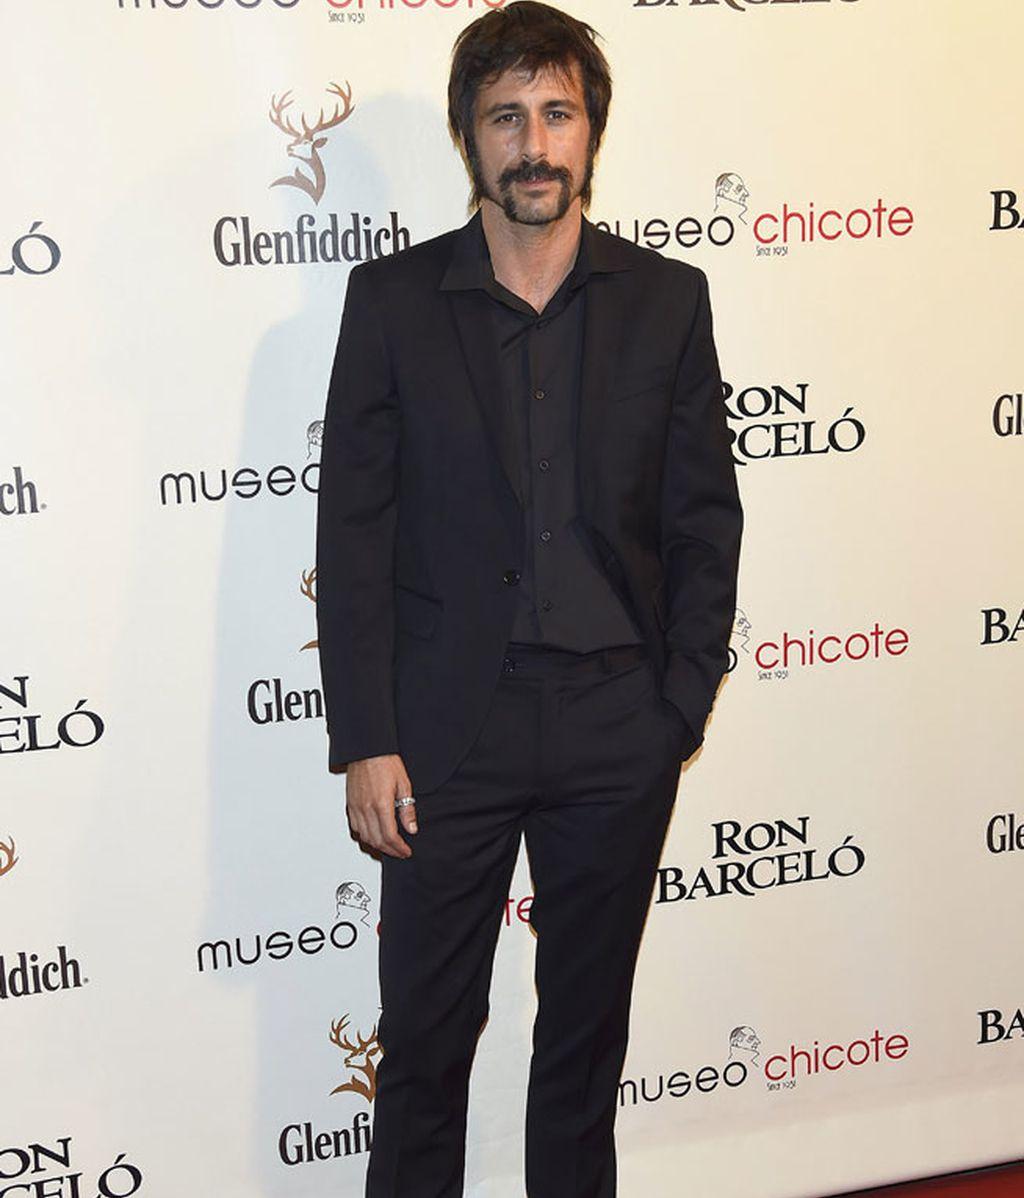 Hugo Silva, negro riguroso con traje de chaqueta